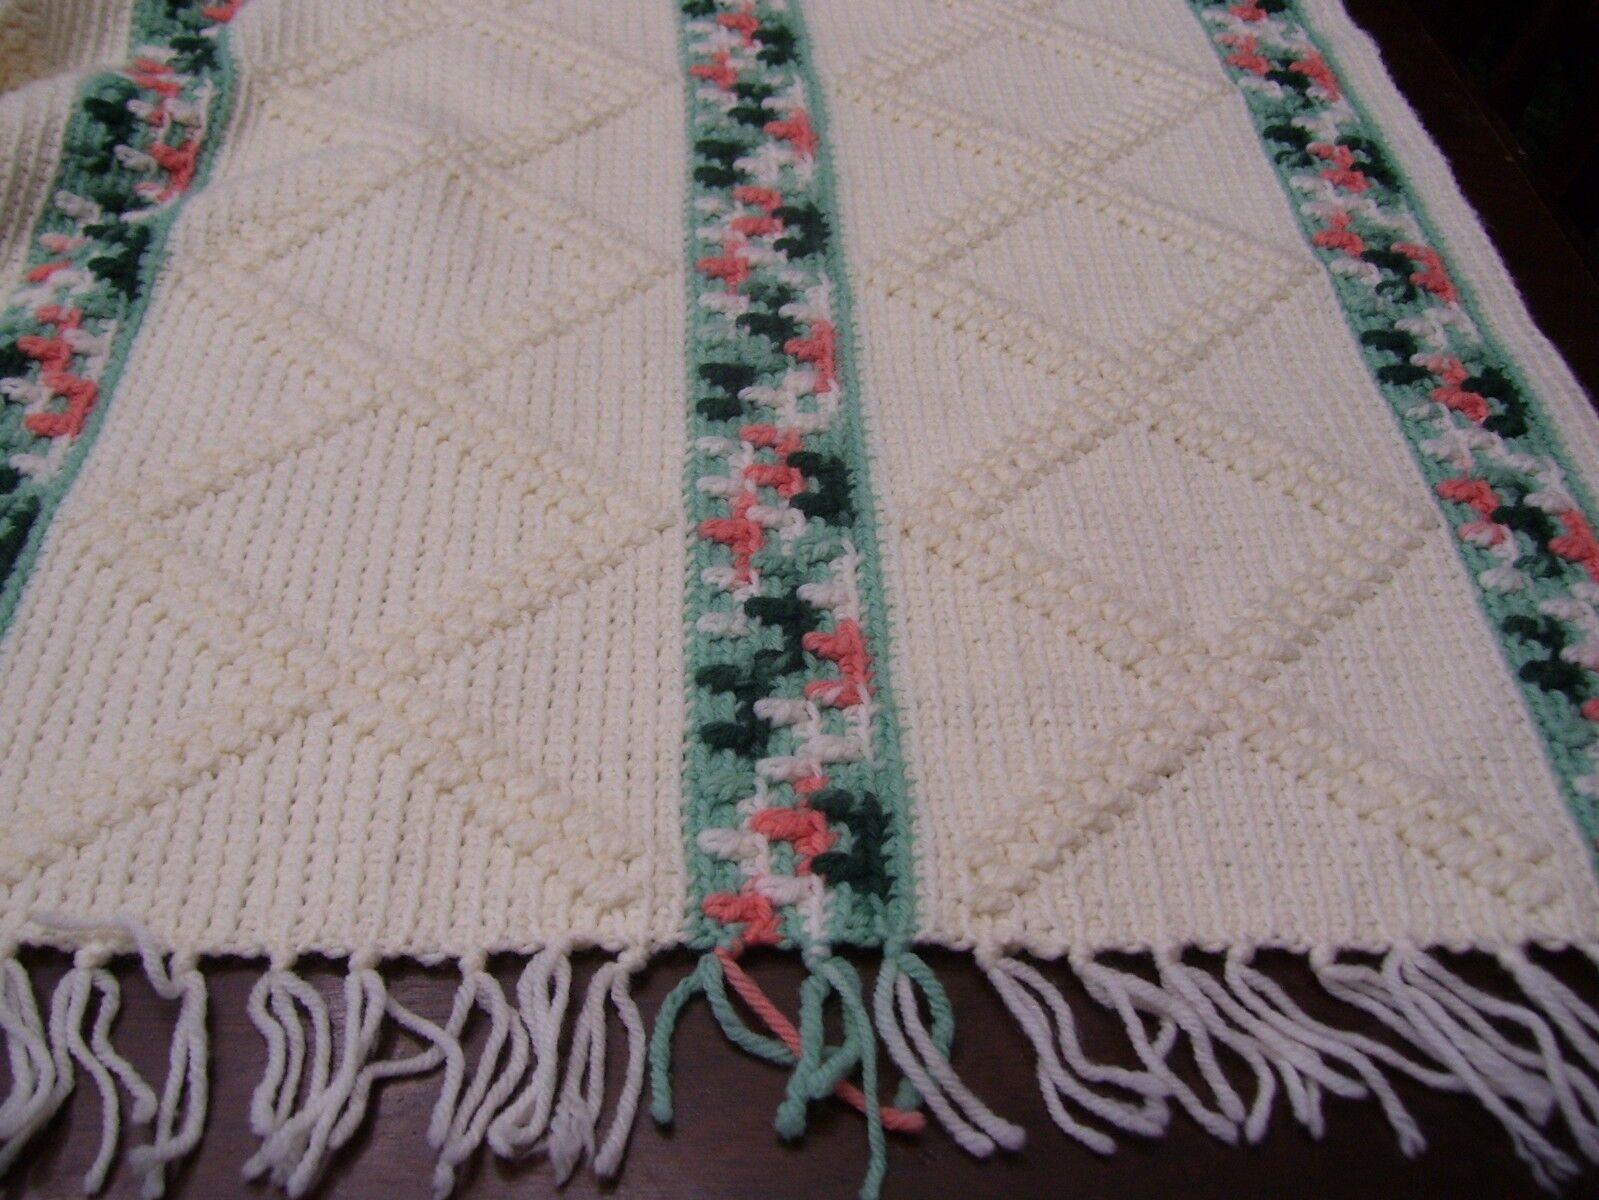 VTG Crochet Afghan Throw Blanket Raised Braid Fringed Beige Peach Green 61